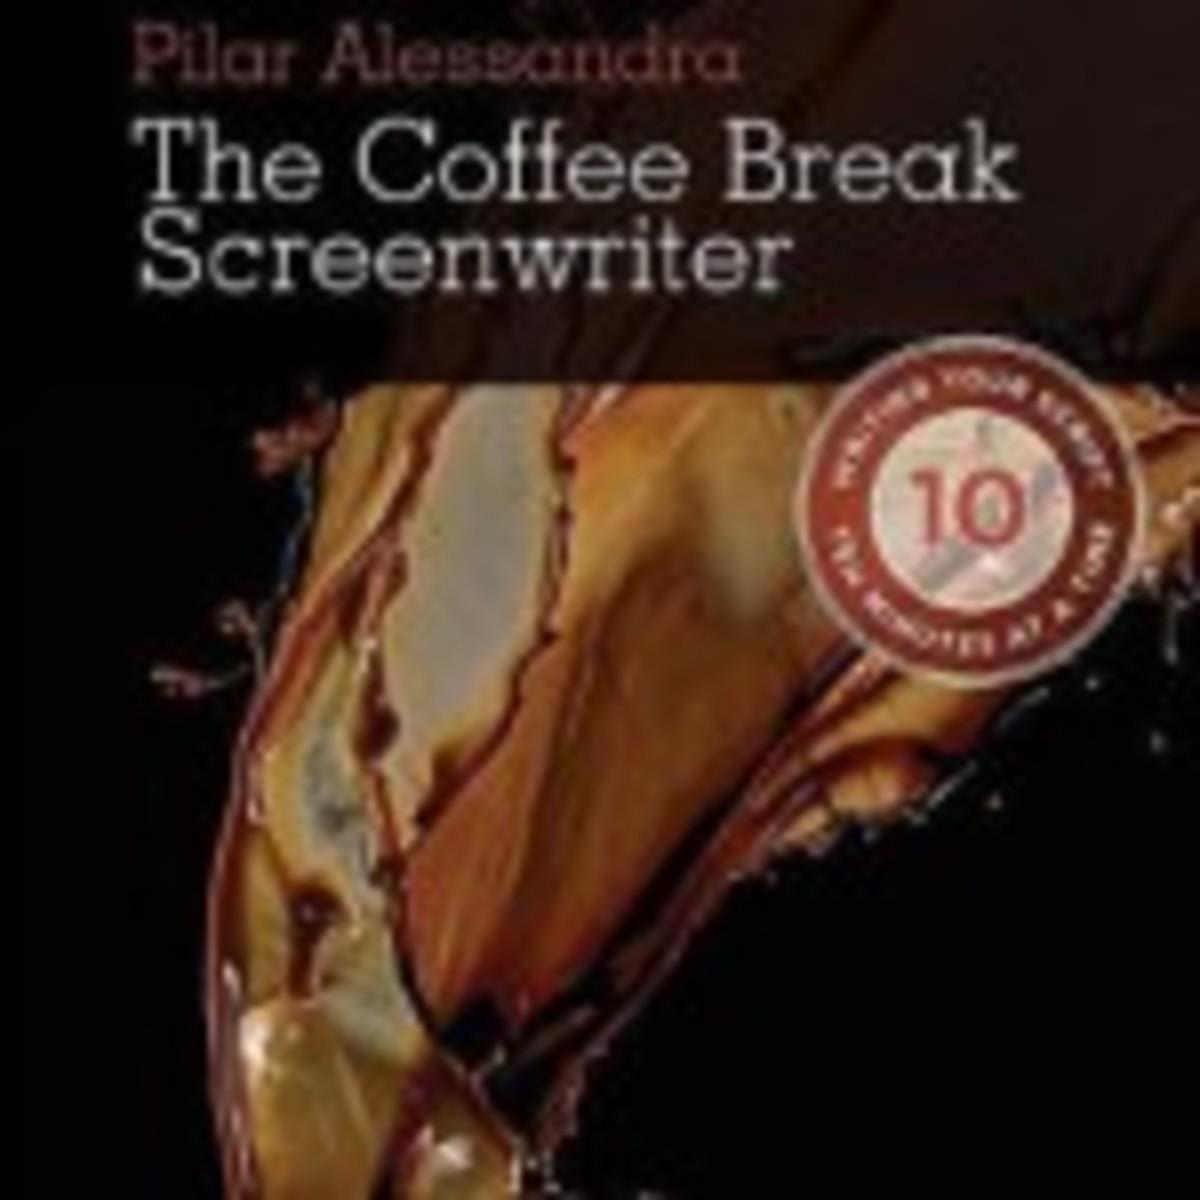 coffee-break-screenwriter-pilar-alessandra_medium